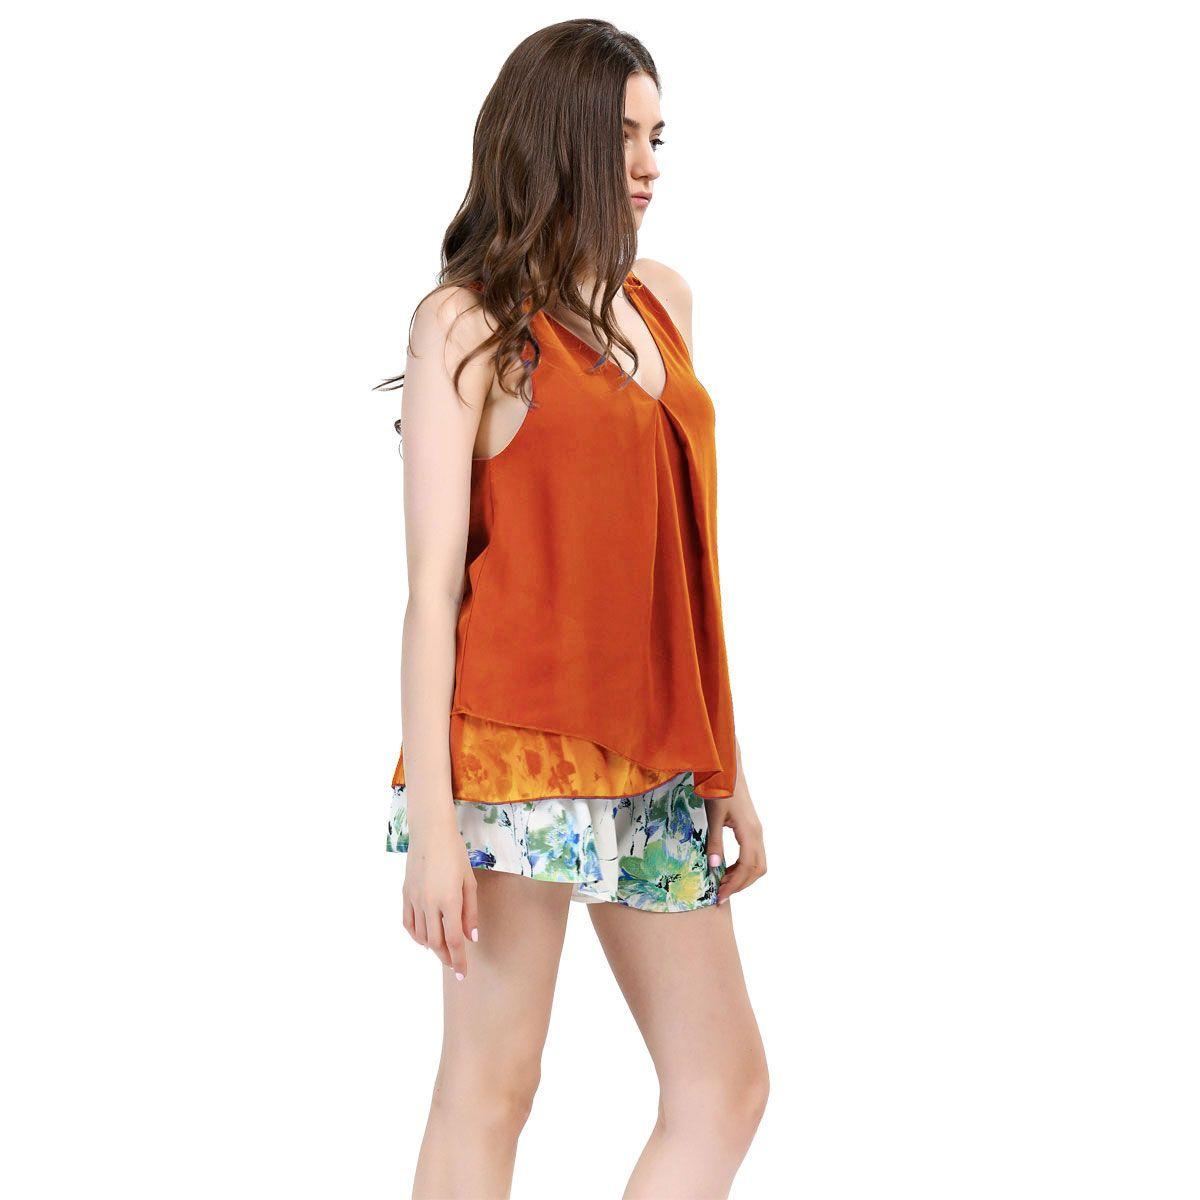 T-Shirt For Women 2016 summer High quality Women Blouses v neck Tops shirts For Women Clothing sleeveless pullover Chiffon Blouse